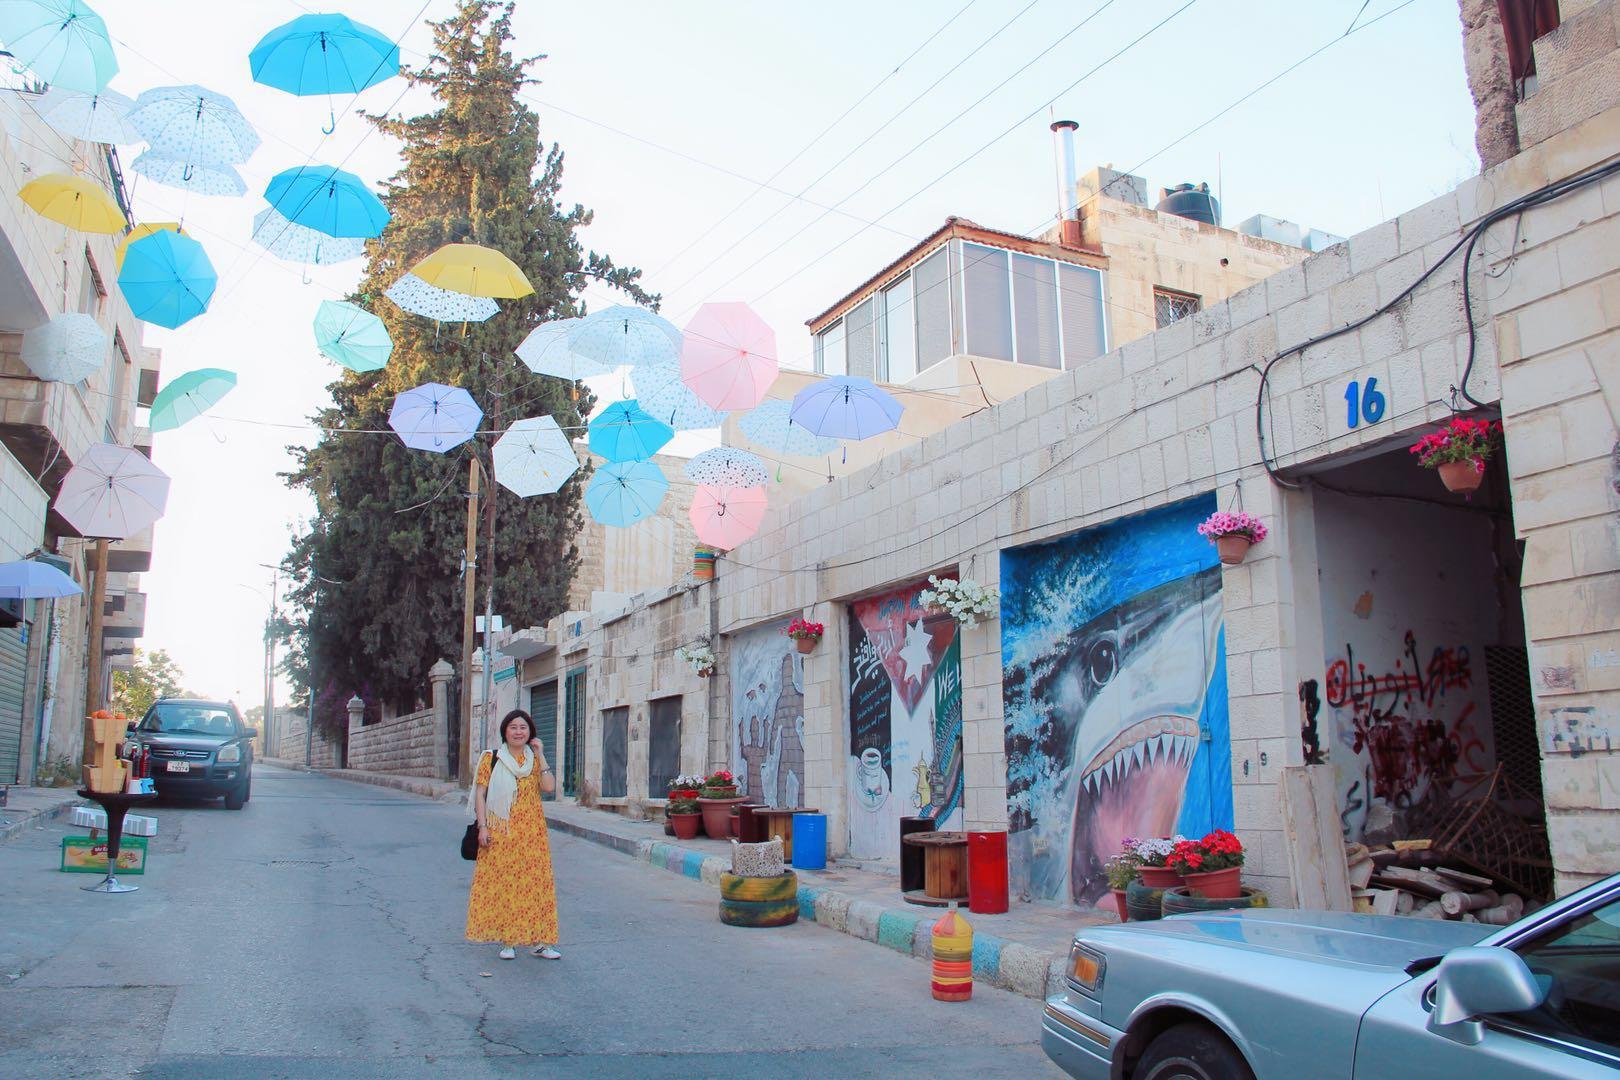 upsouth-mingmingfneg-jordan-amman-rainbow-street-selfie.jpeg